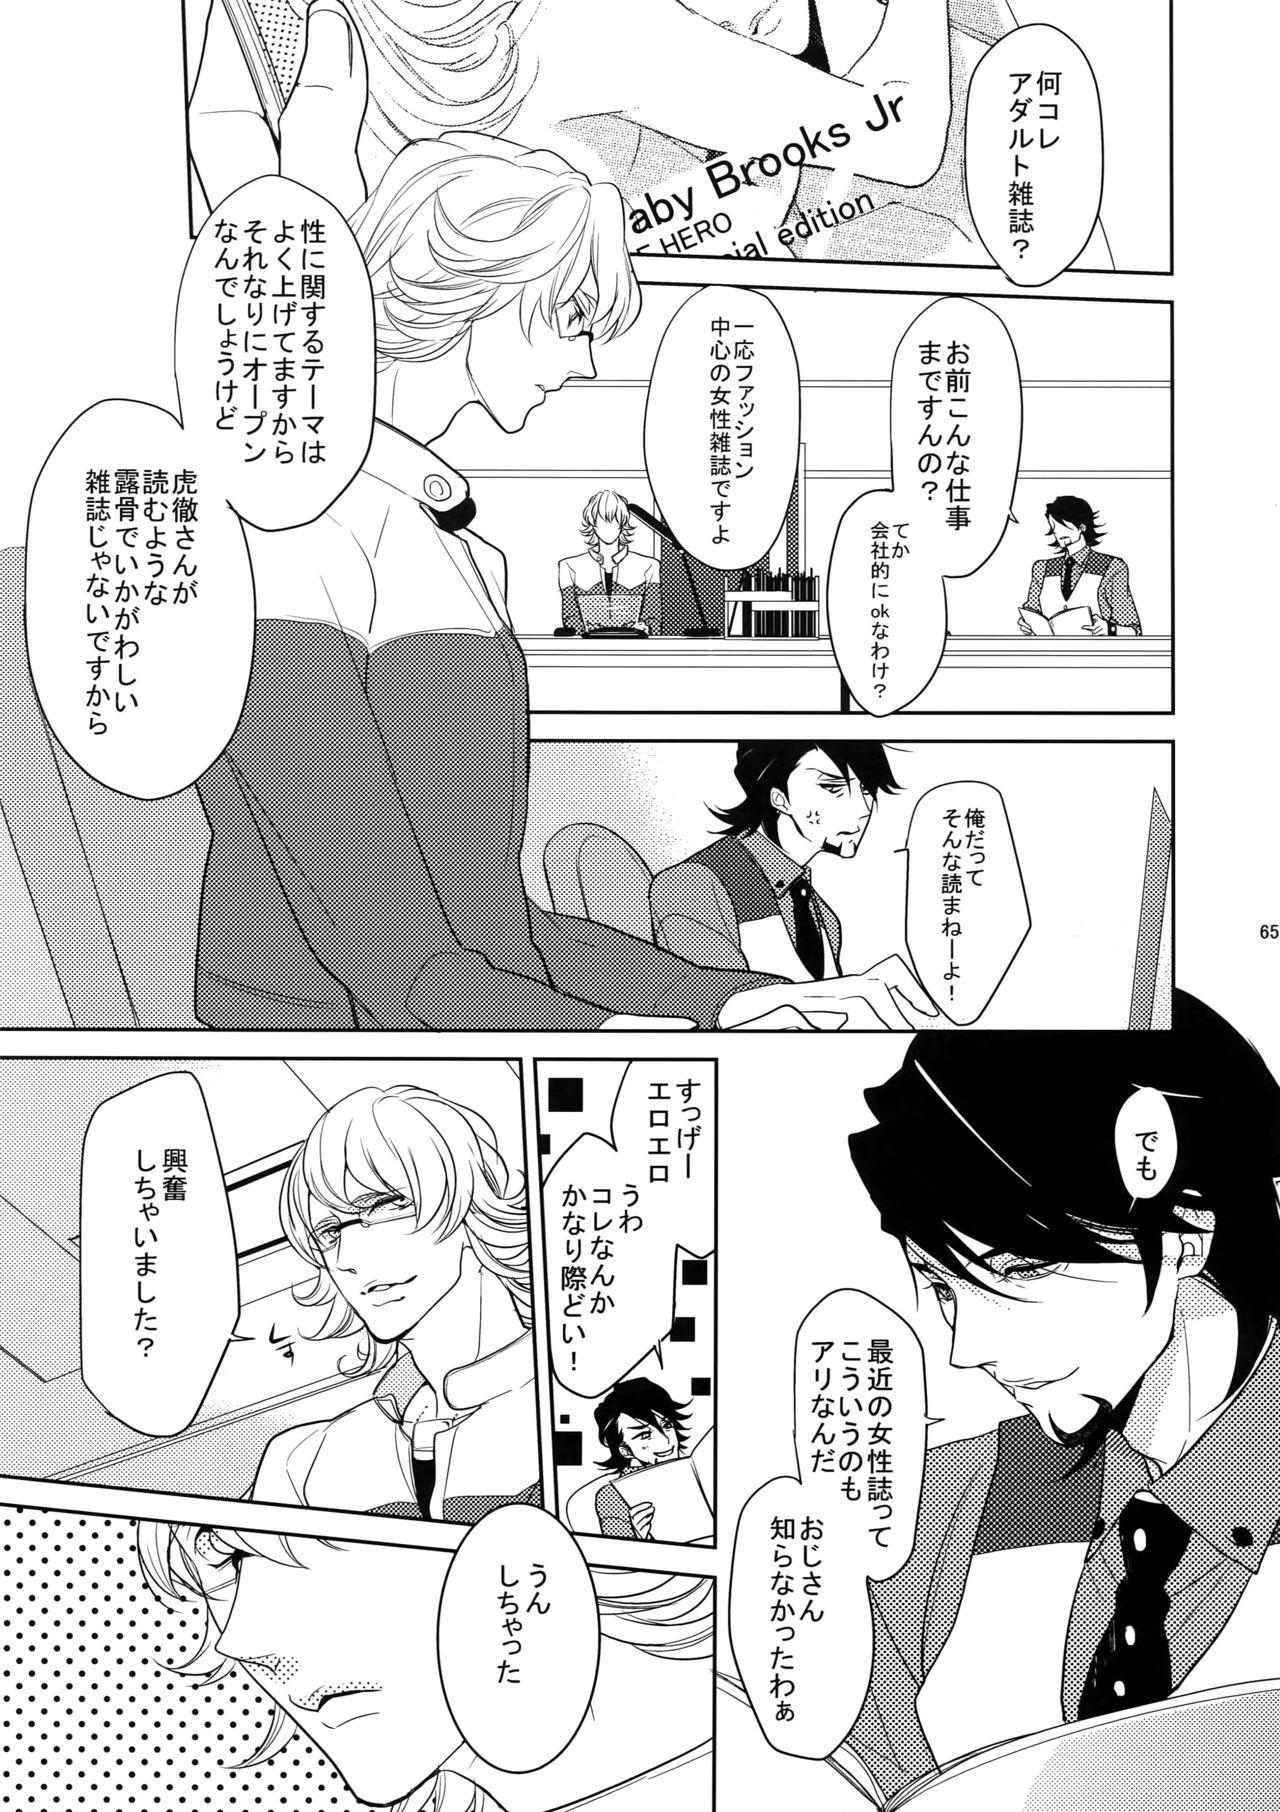 BOROZS Usagi Tora Sairoku 63